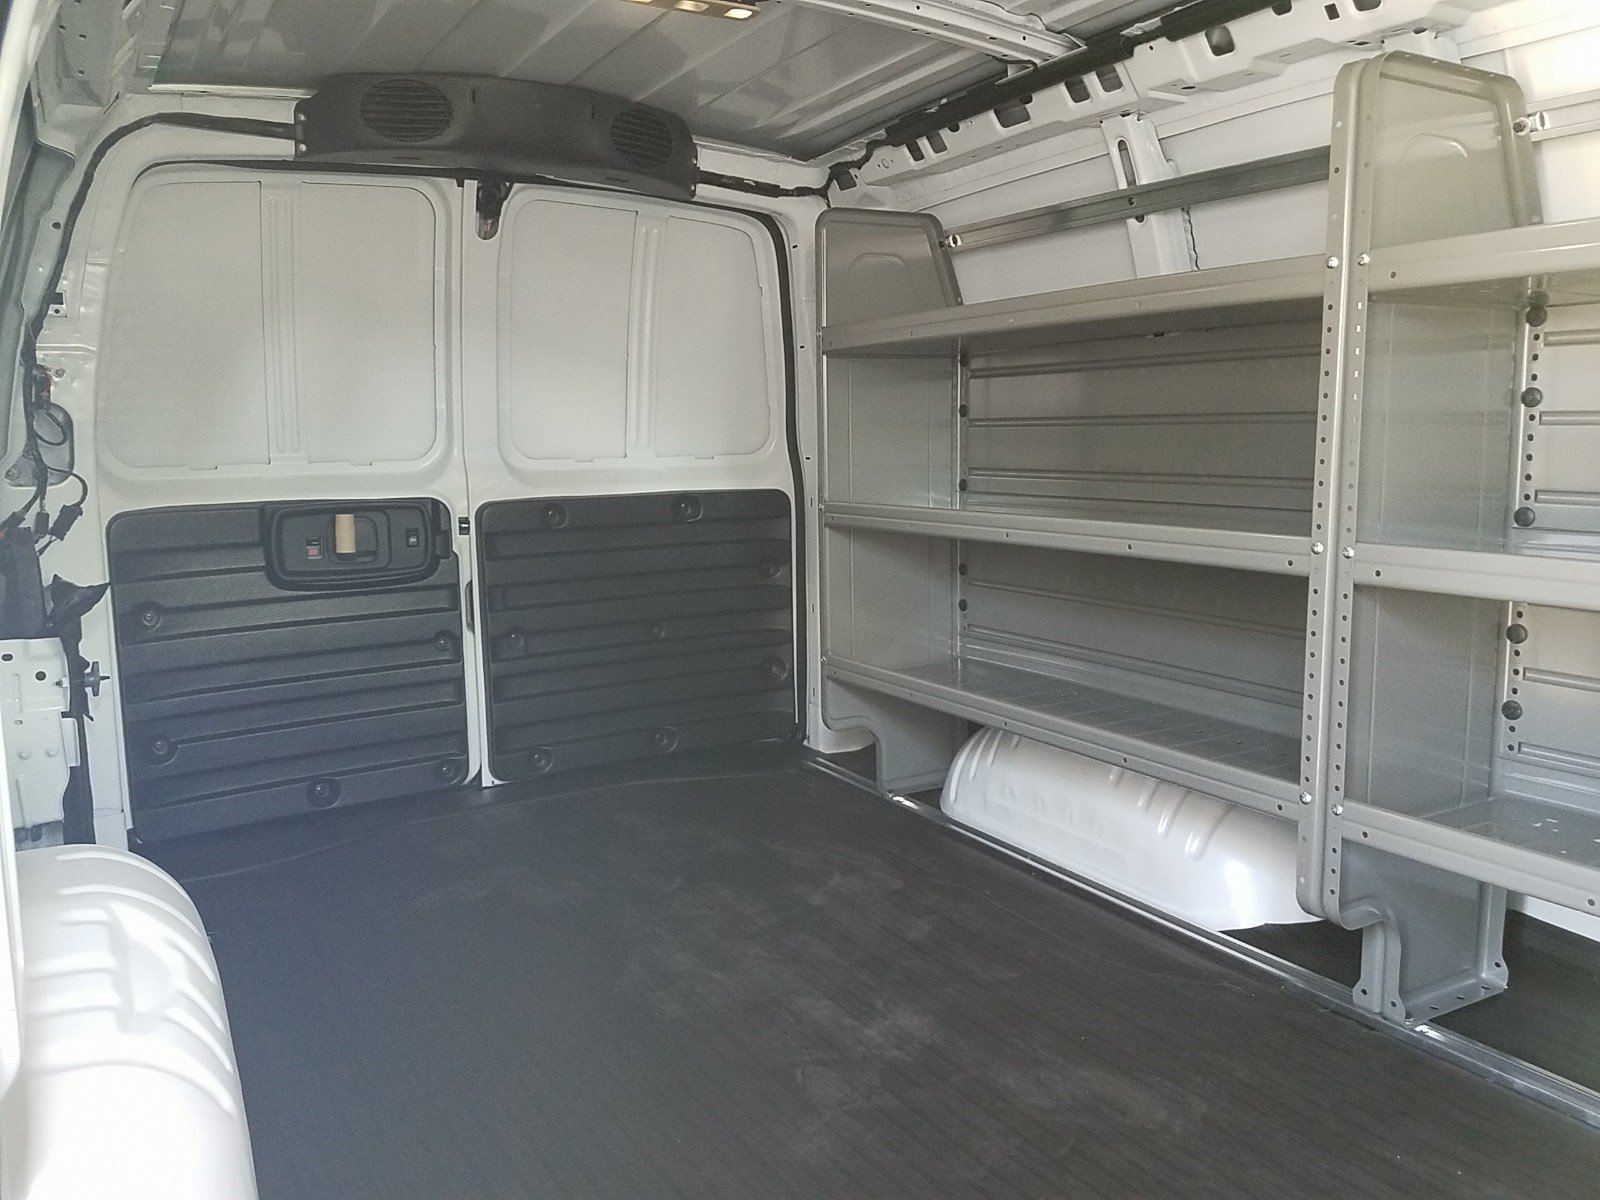 2019 Express 2500 4x2,  Adrian Steel Upfitted Cargo Van #K1261318 - photo 1